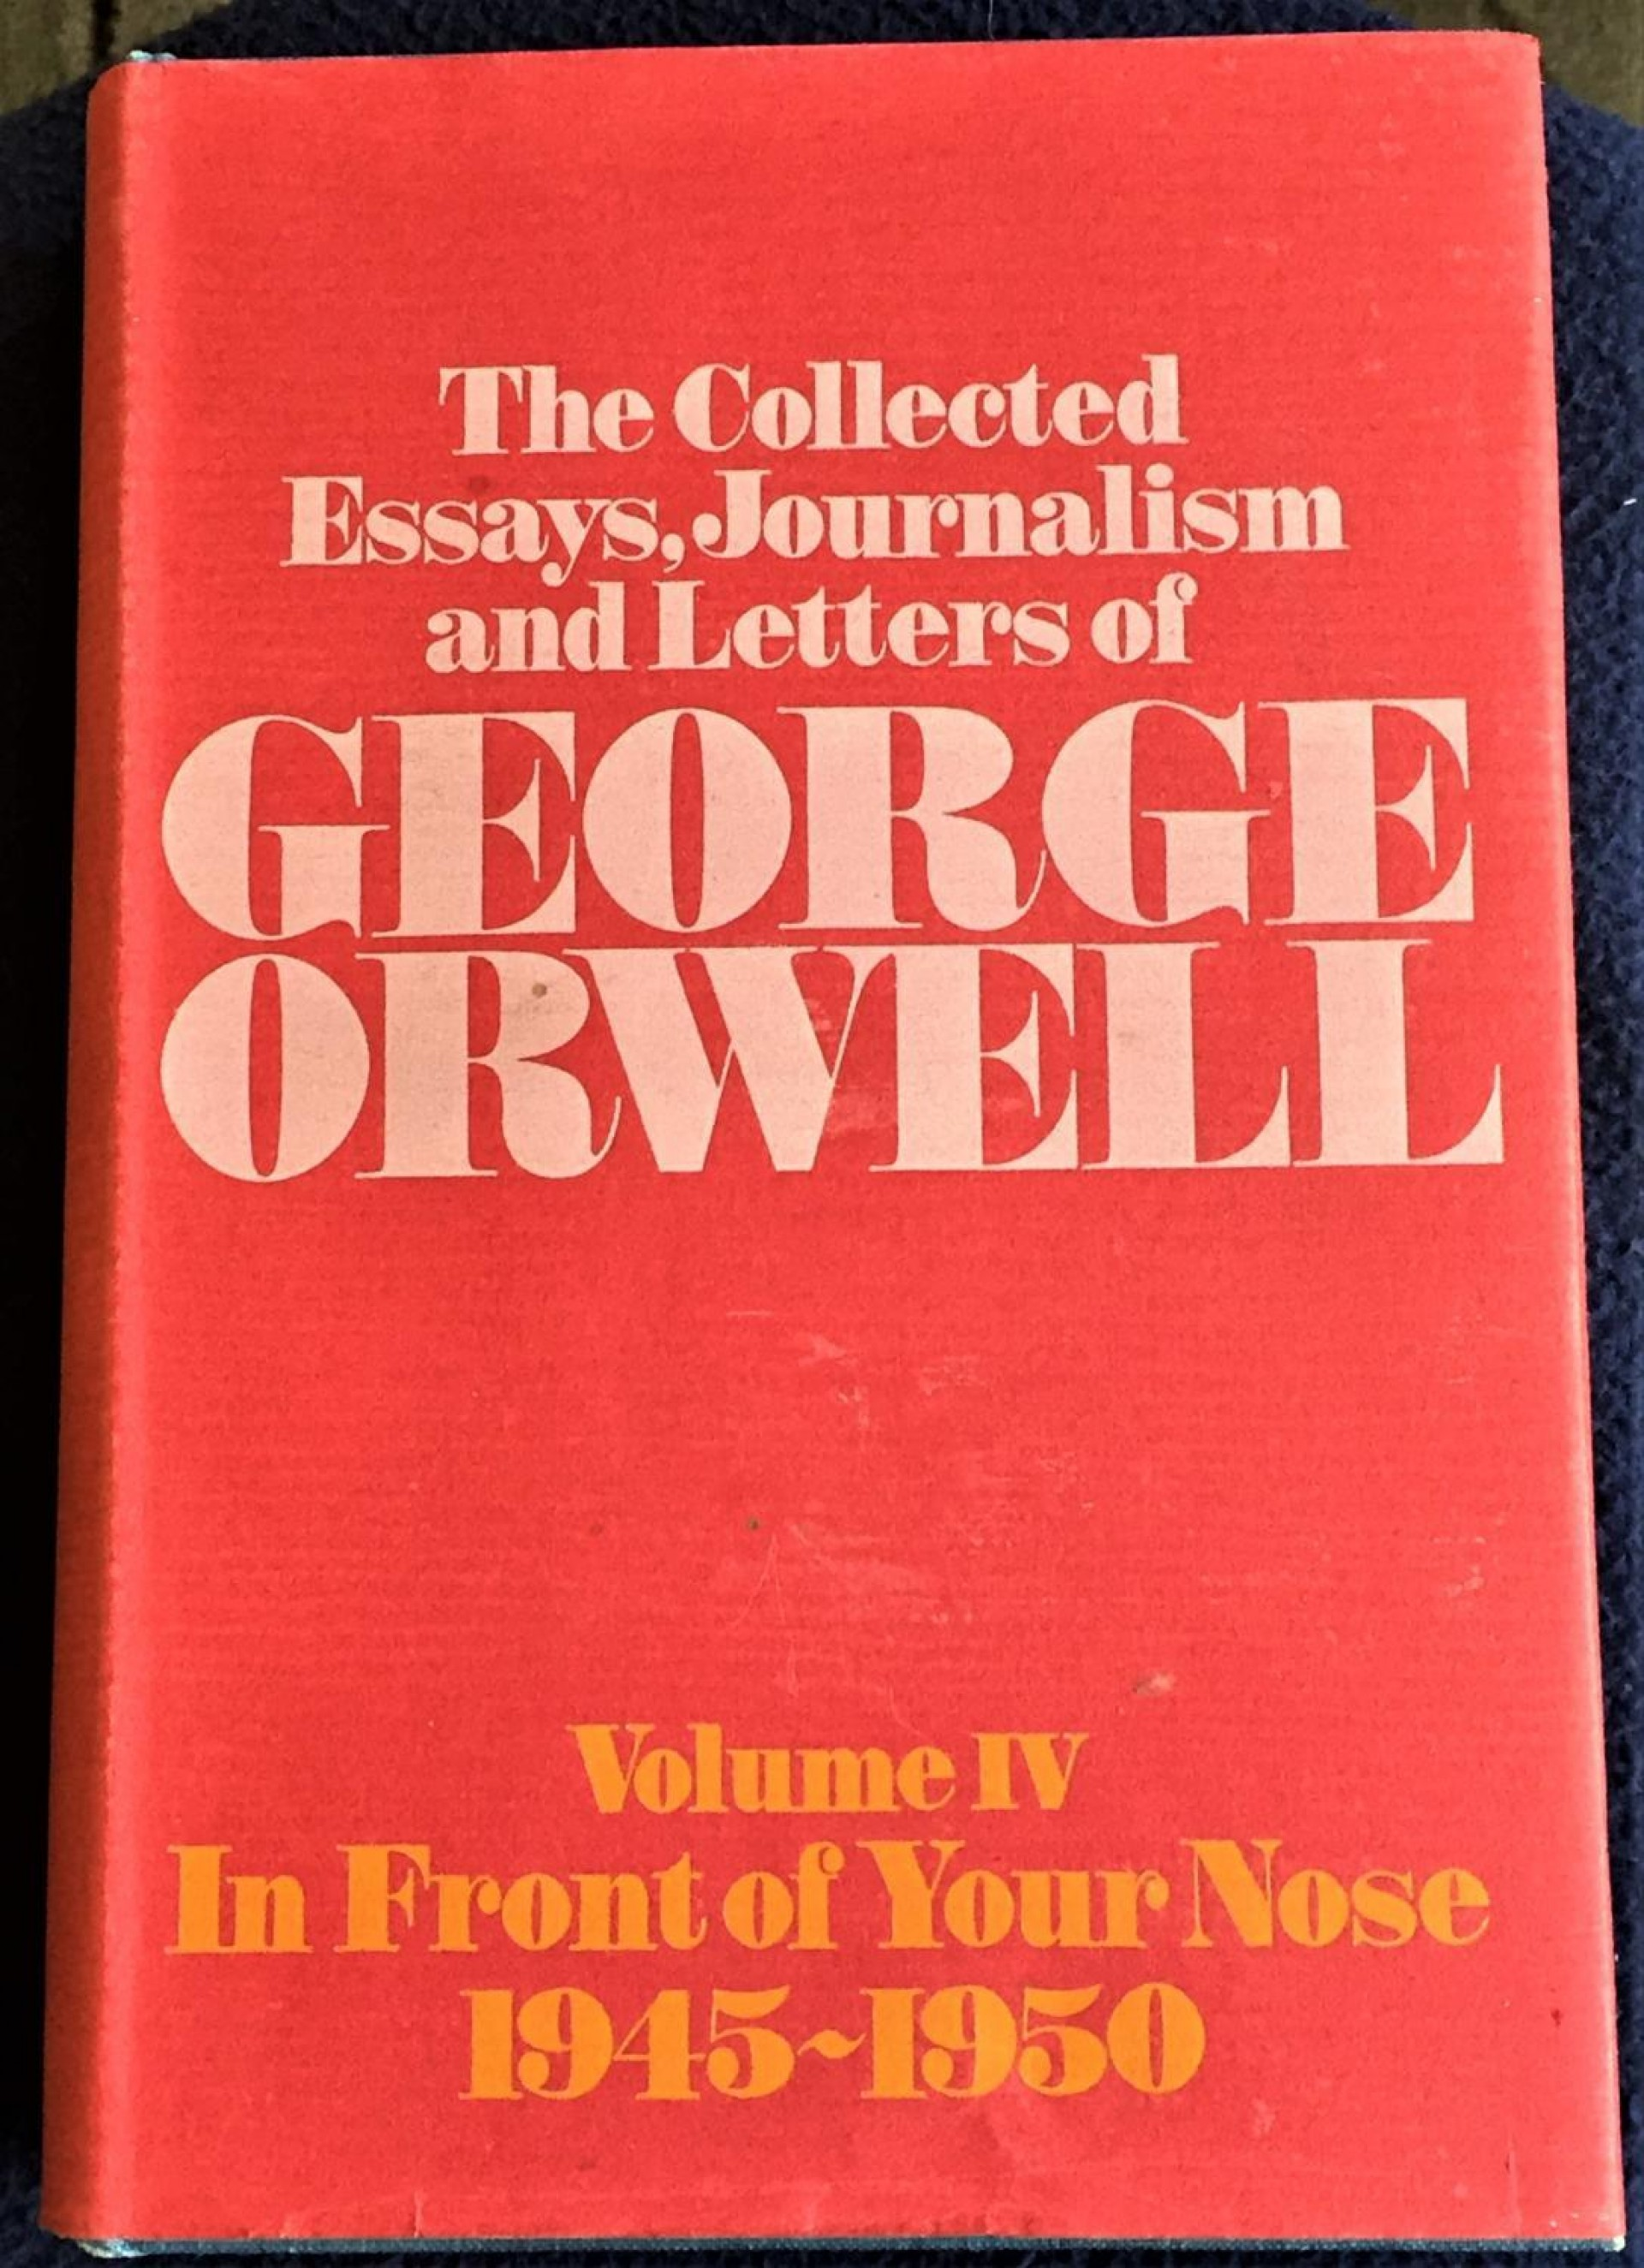 014 George Orwell Essays Essay Frightening 1984 Summary Collected Pdf On Writing 1920